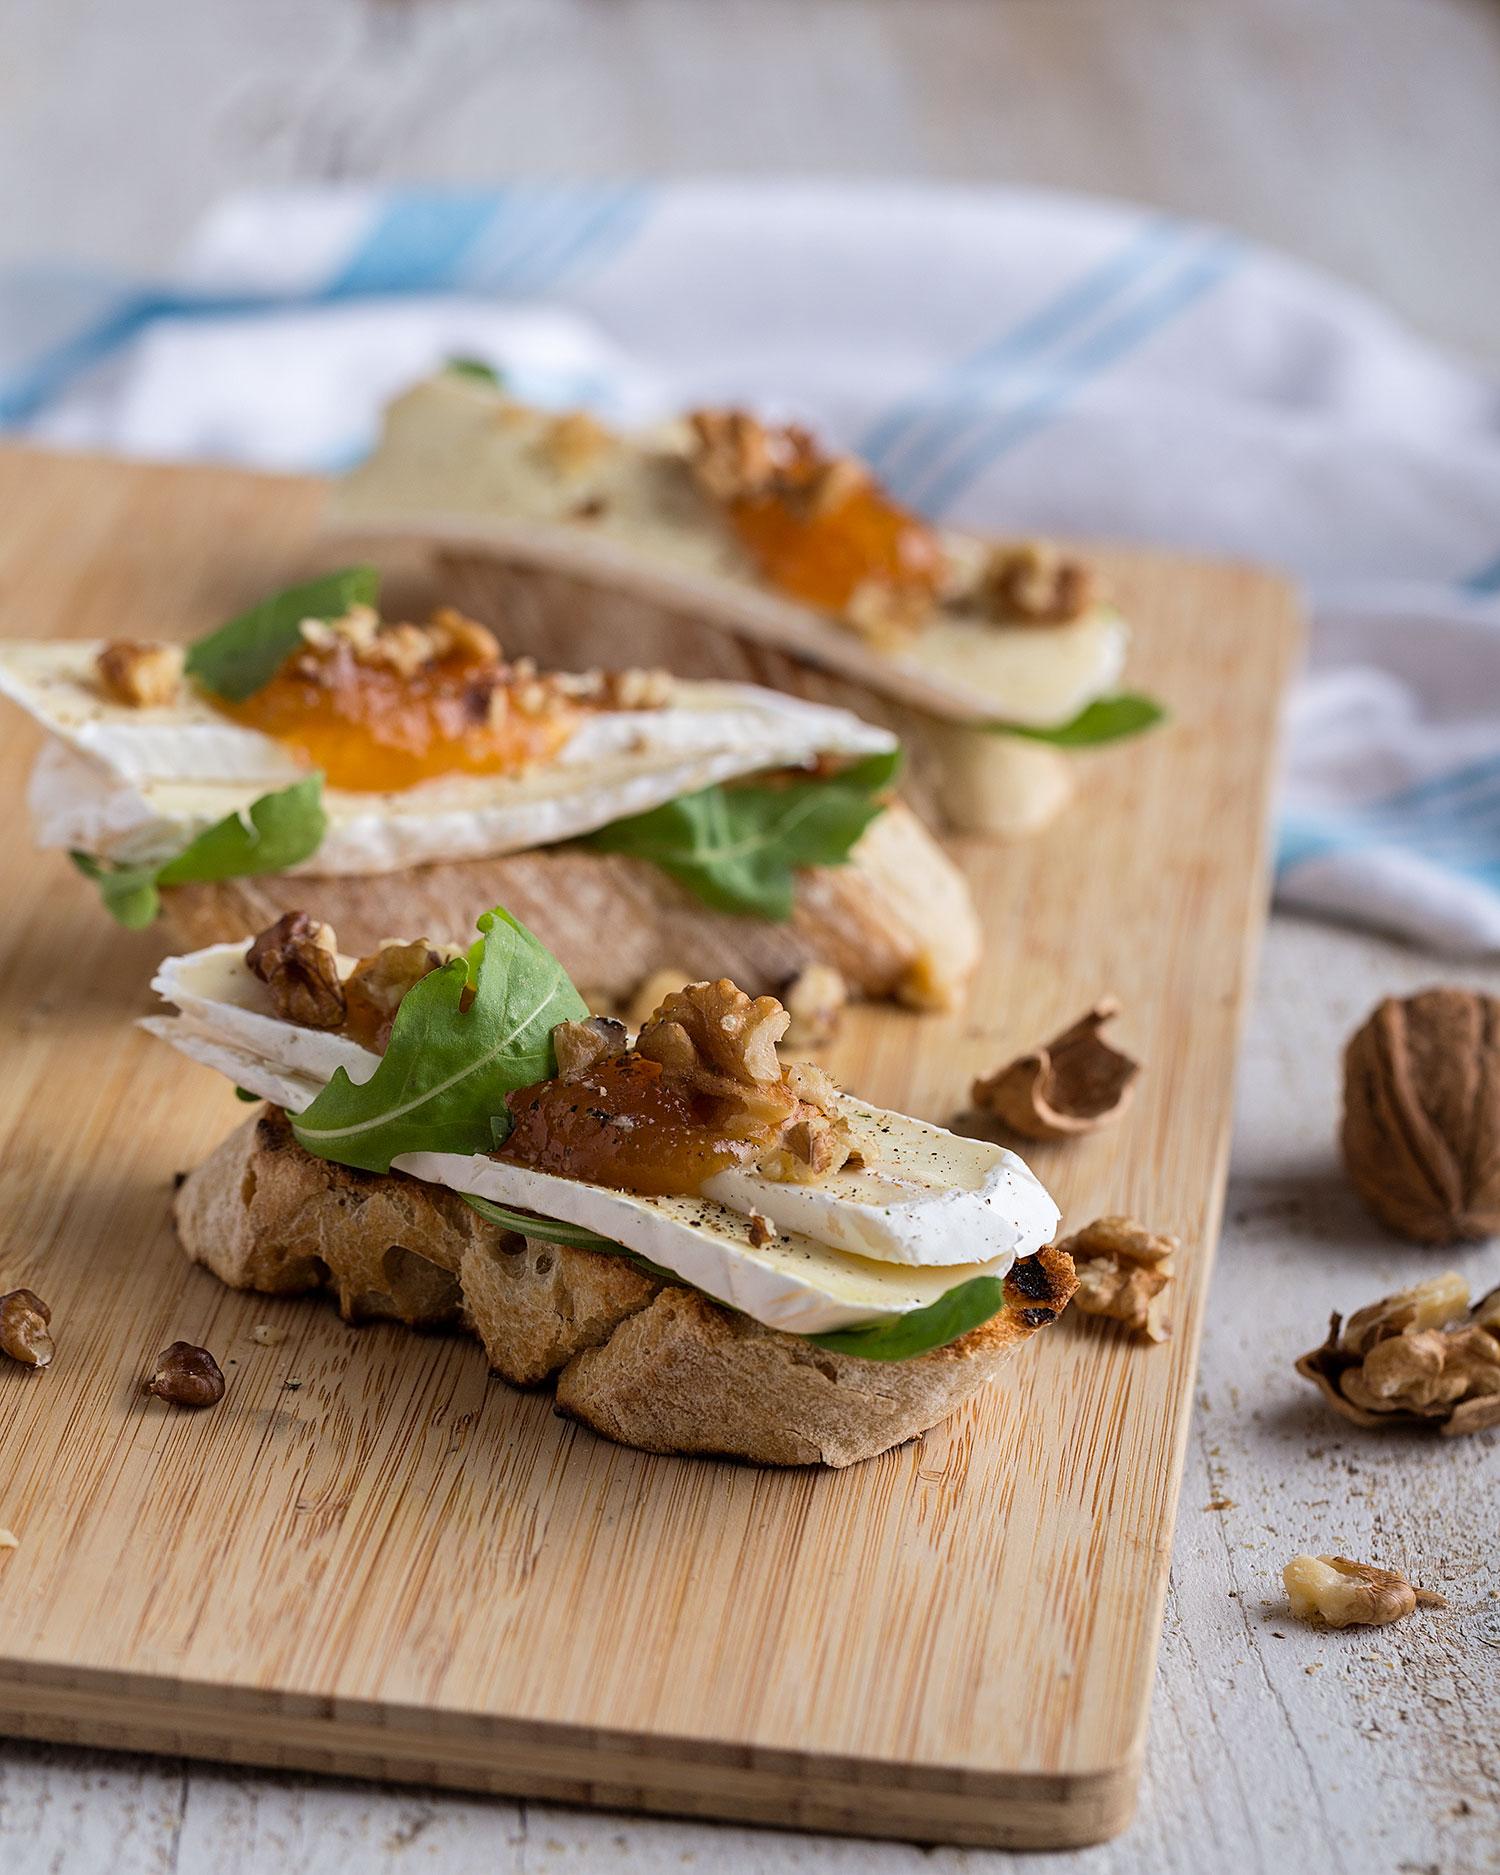 corina-landa-food-photography-fotografia-gastronomica-15.jpg